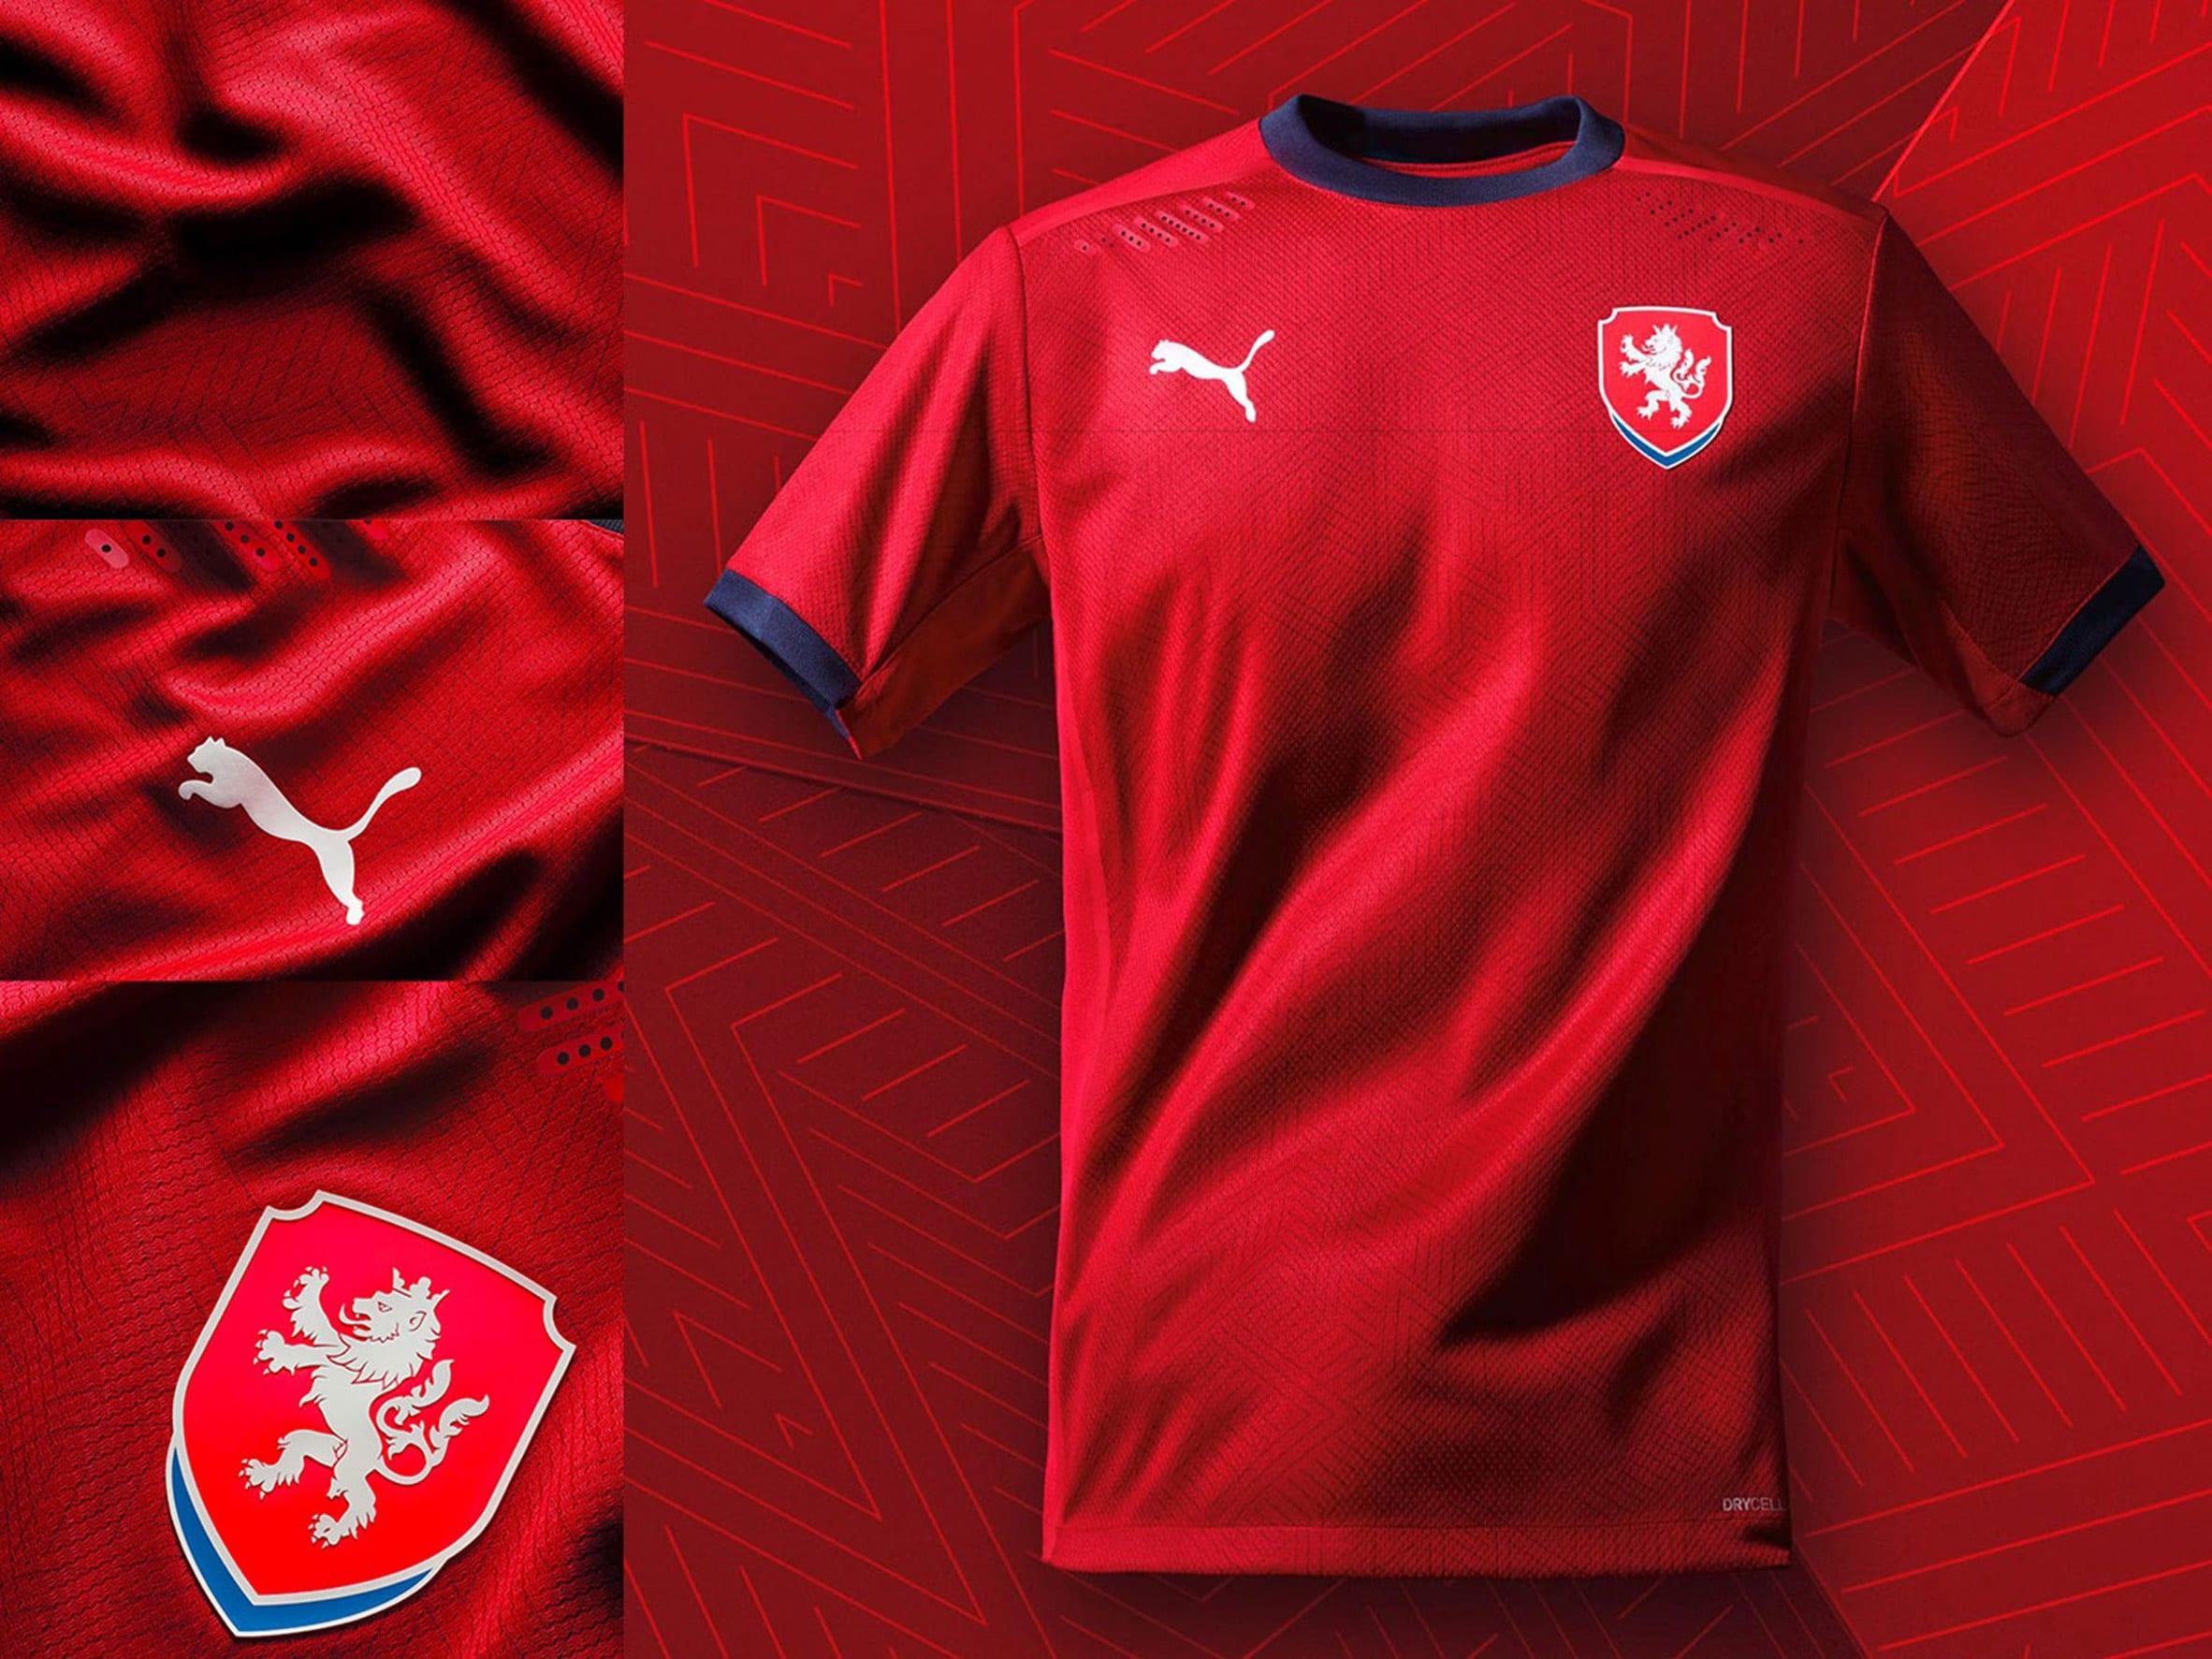 Puma kit for Switzerland